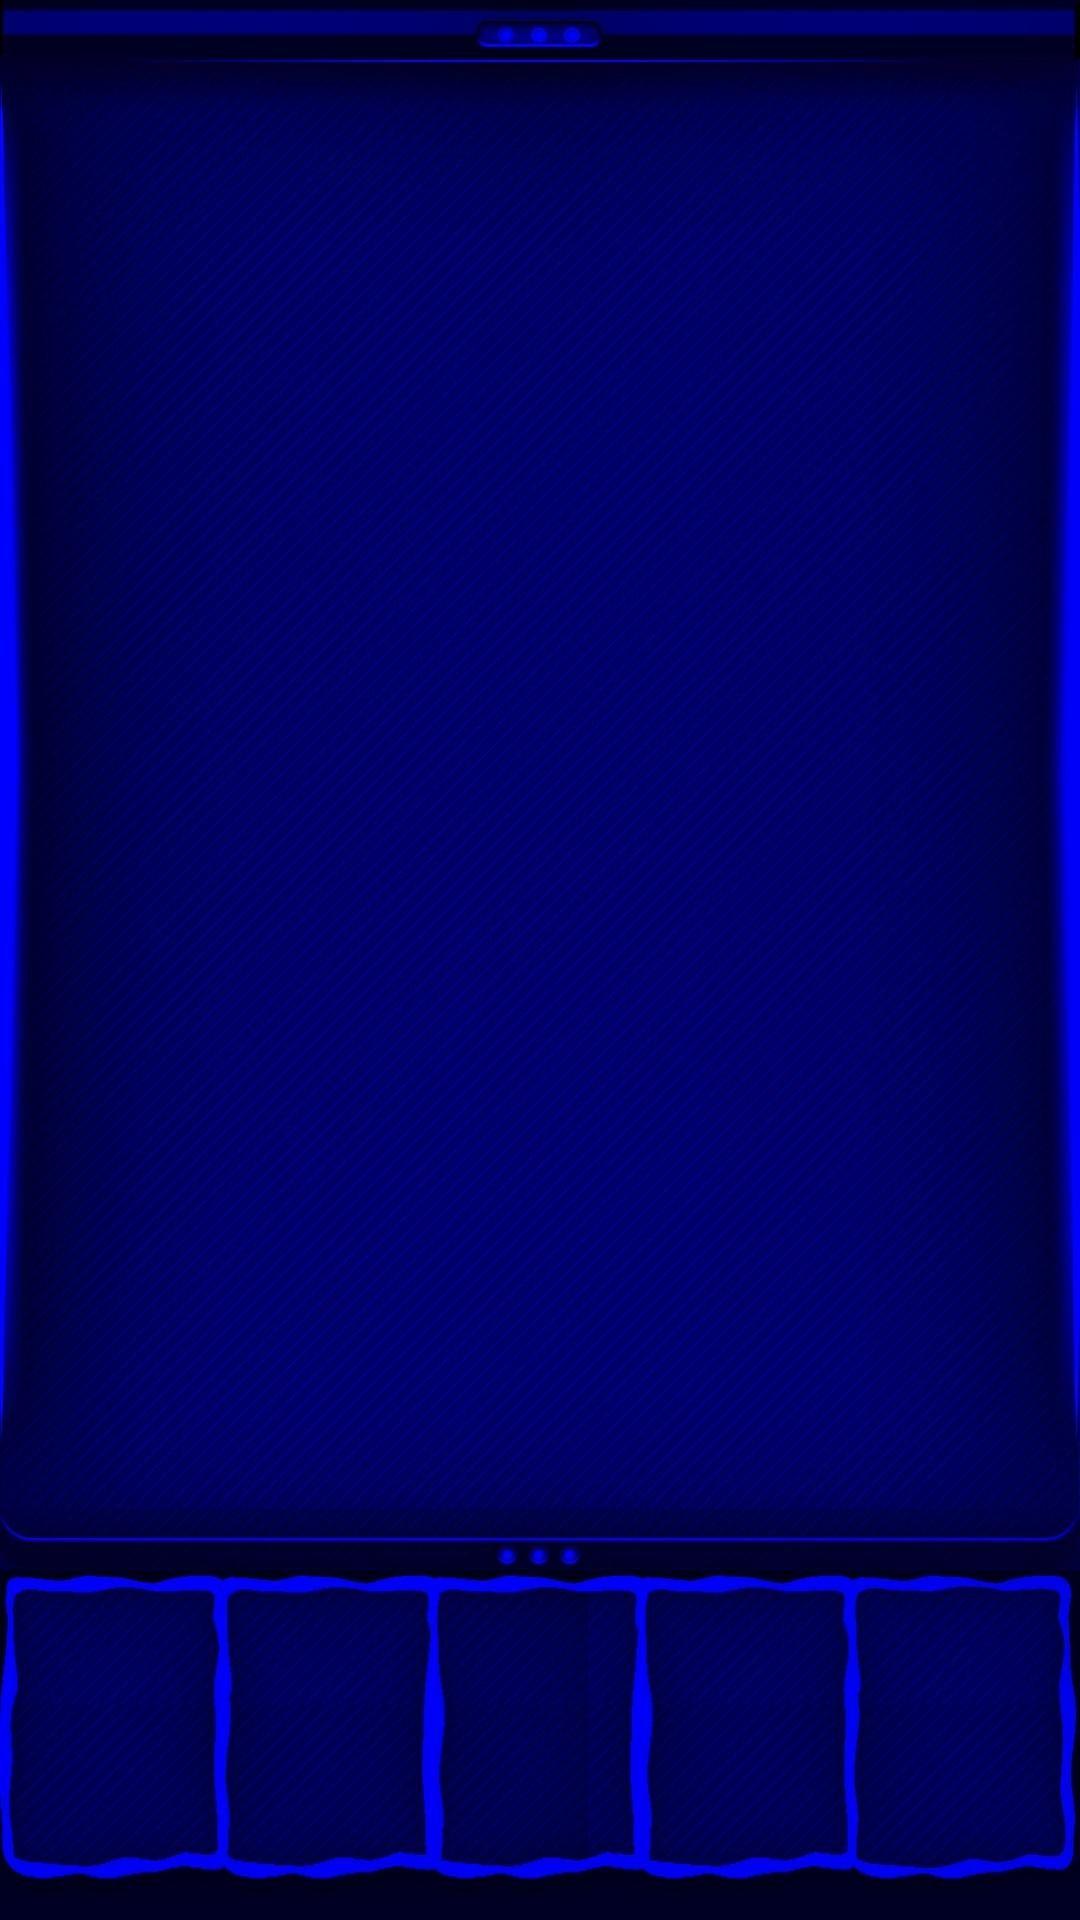 S7 Edge Blue Fondos De Pantalla Del Telefono Fondo De Pantalla Movil Imagenes De Fondo